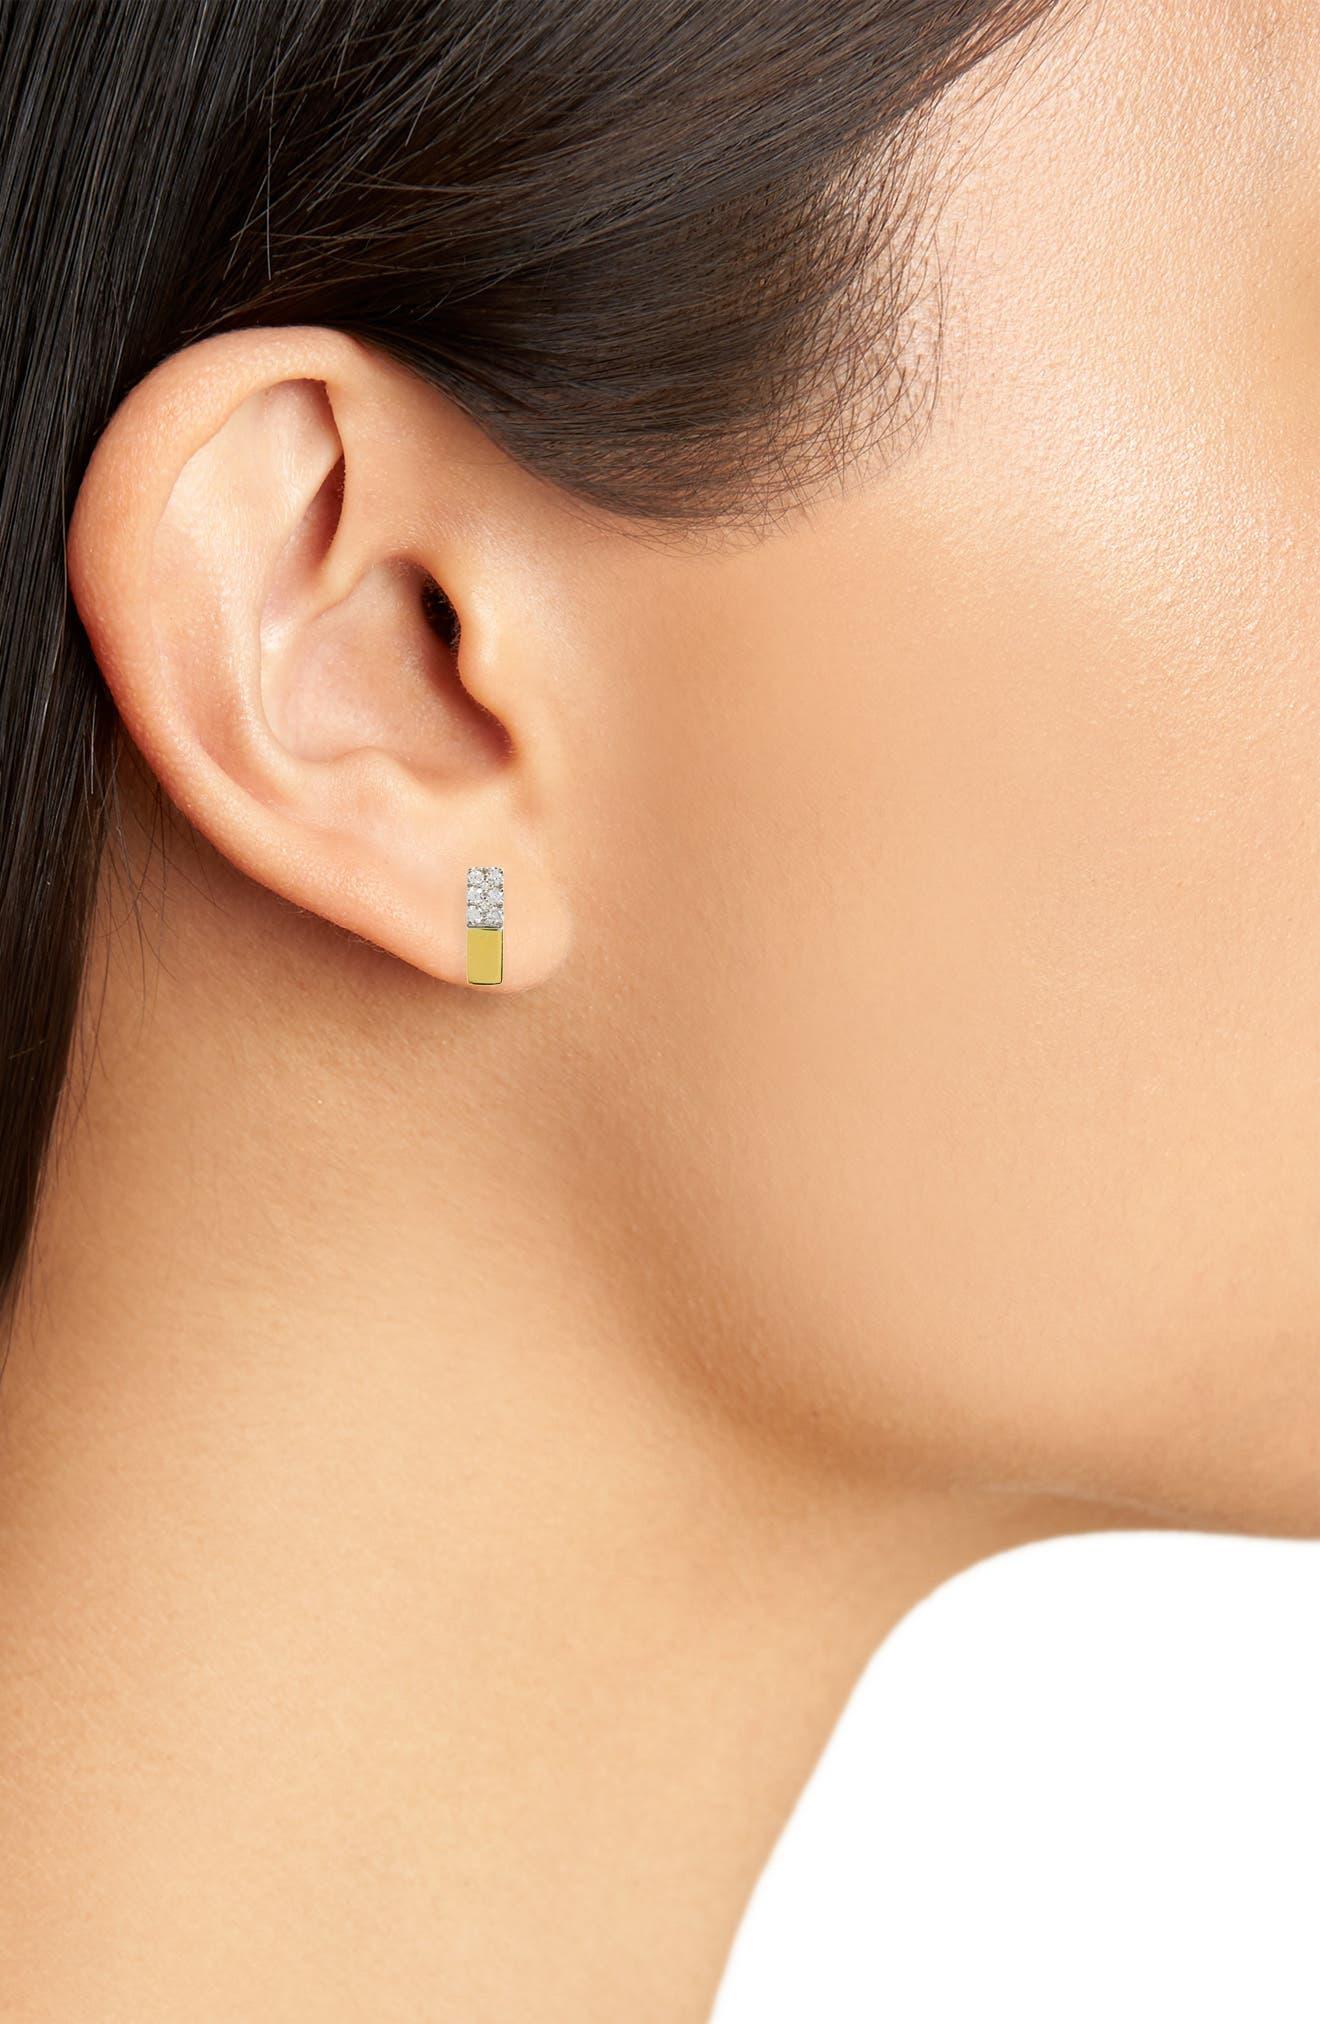 Kiera Diamond & 18K Gold Bar Stud Earrings,                             Alternate thumbnail 2, color,                             Yellow Gold/ White Gold